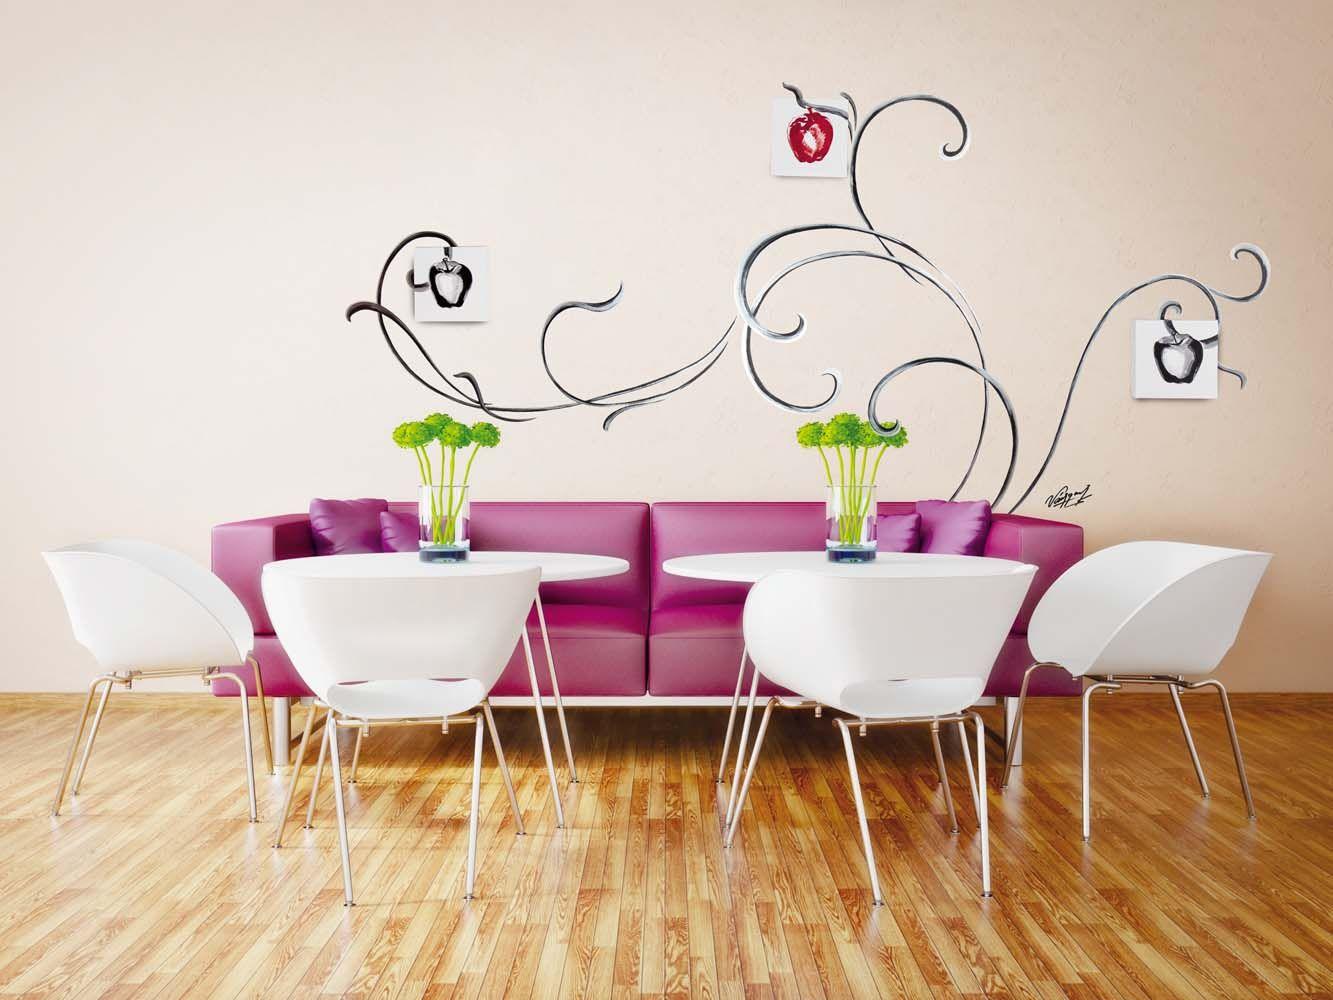 Pintura decorativa para paredes murales divinos for Murales de papel para pared